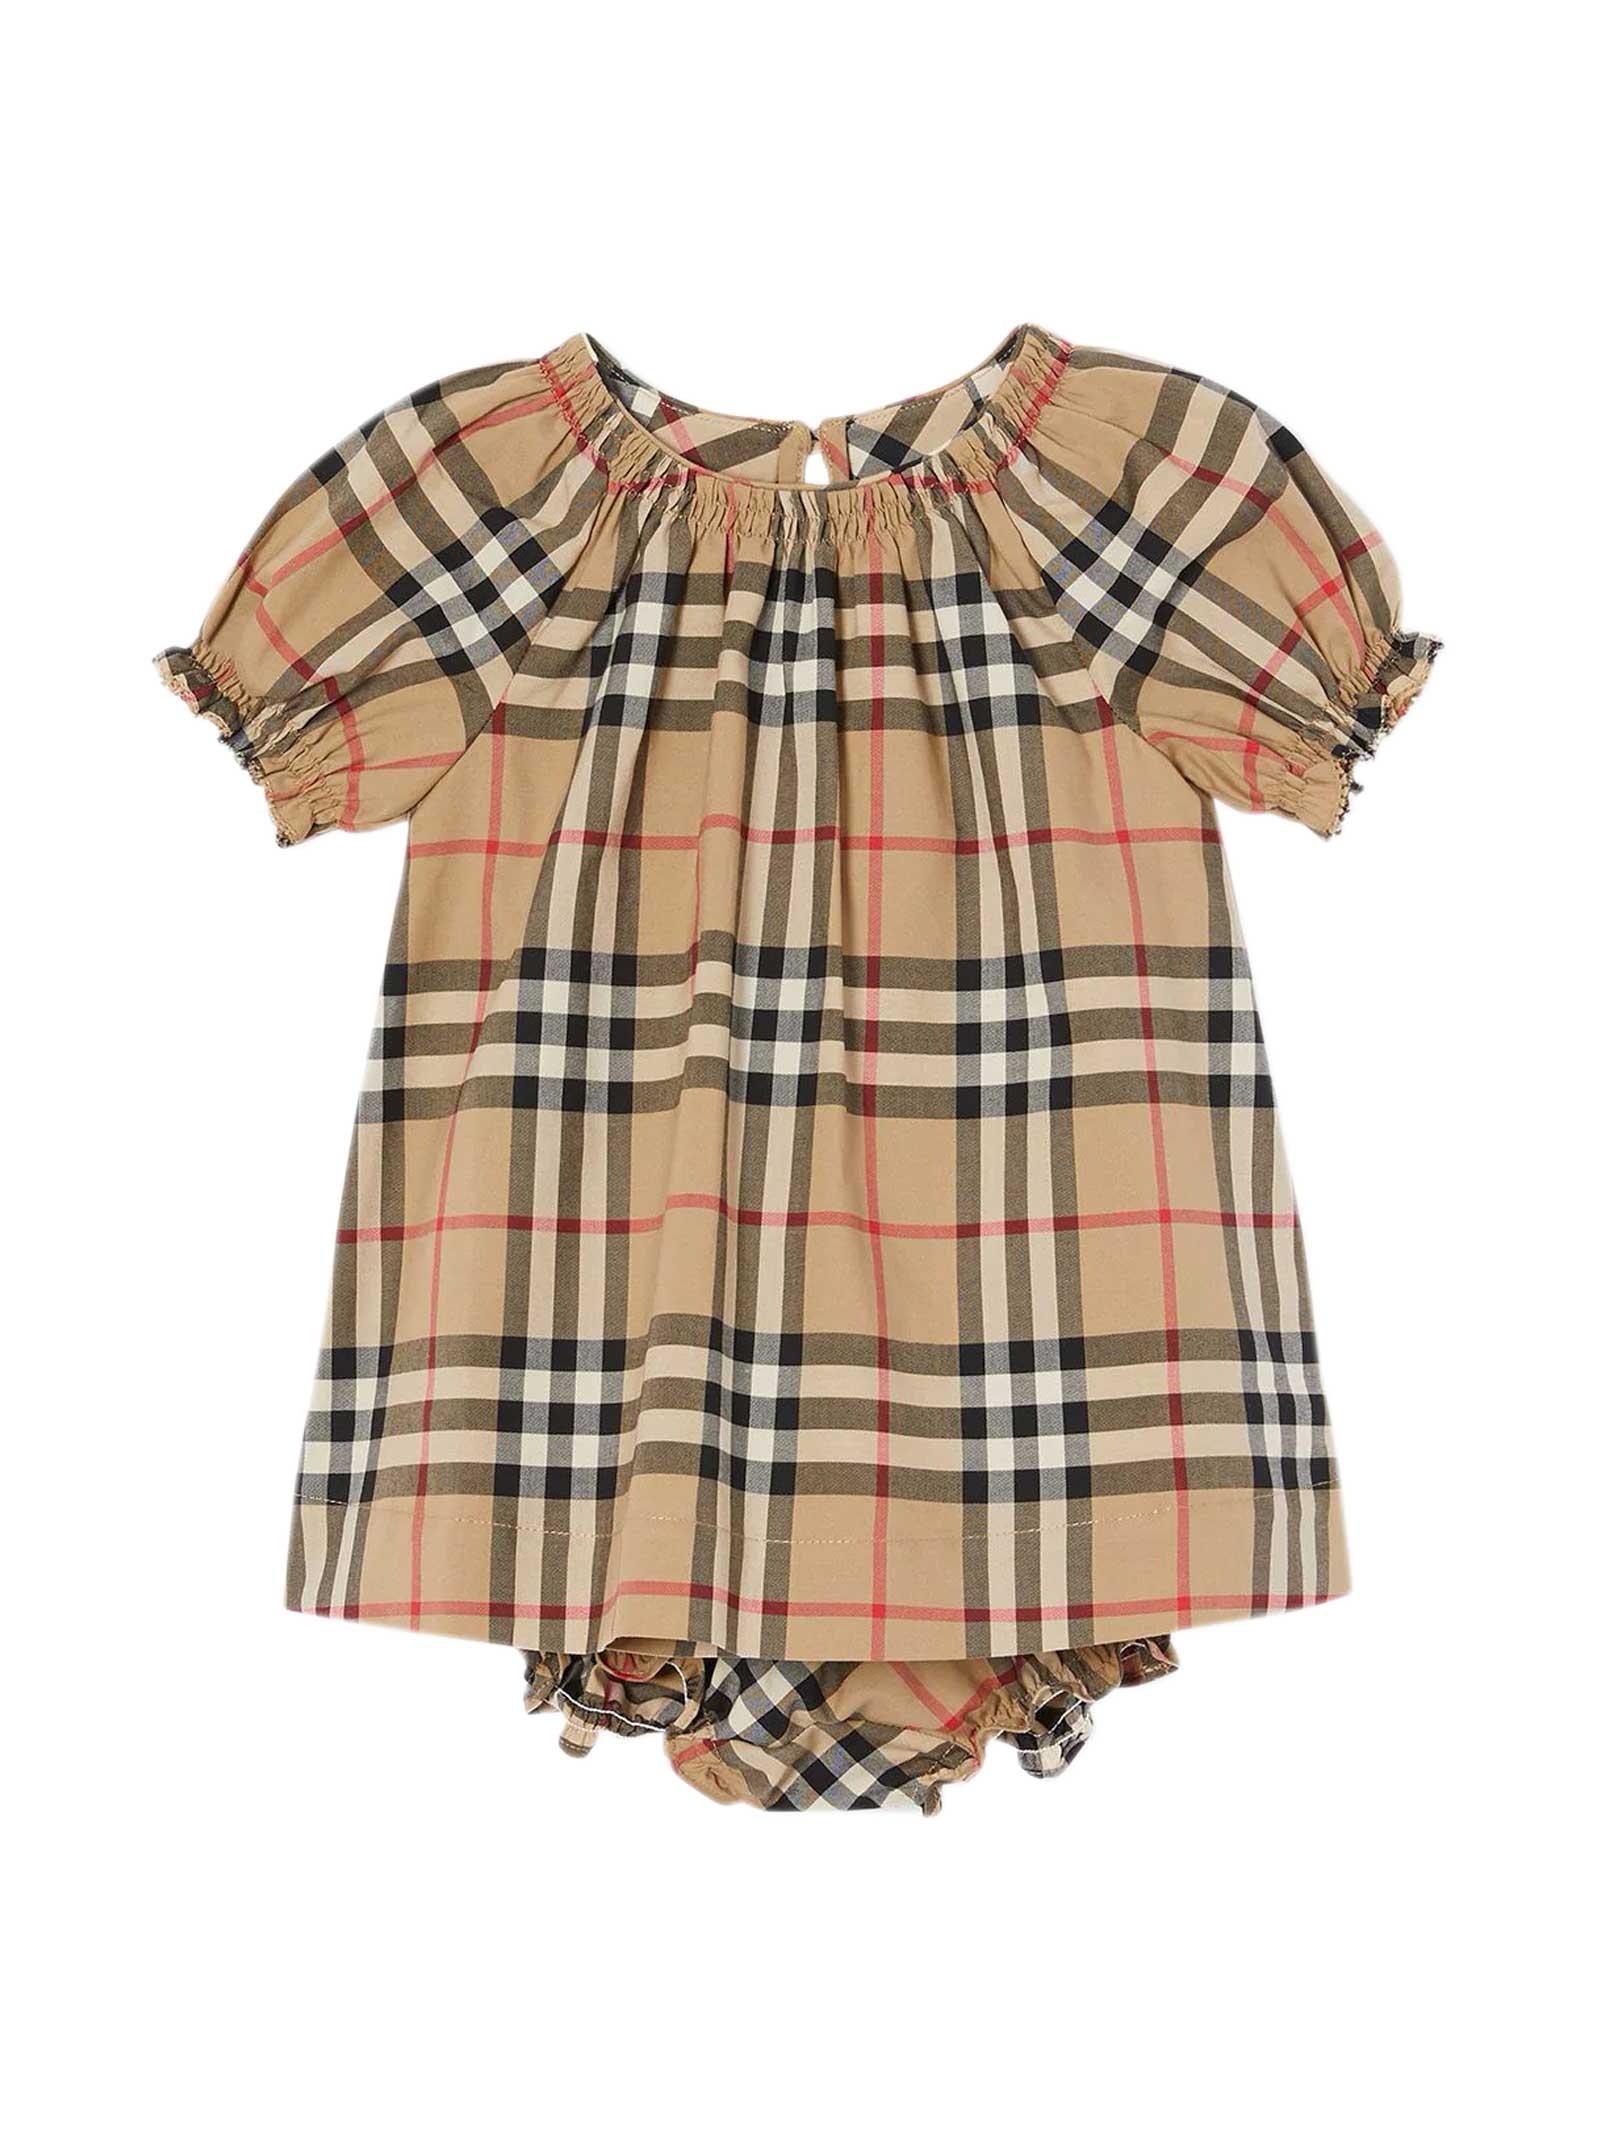 Burberry VINTAGE CHECK PRINT DRESS